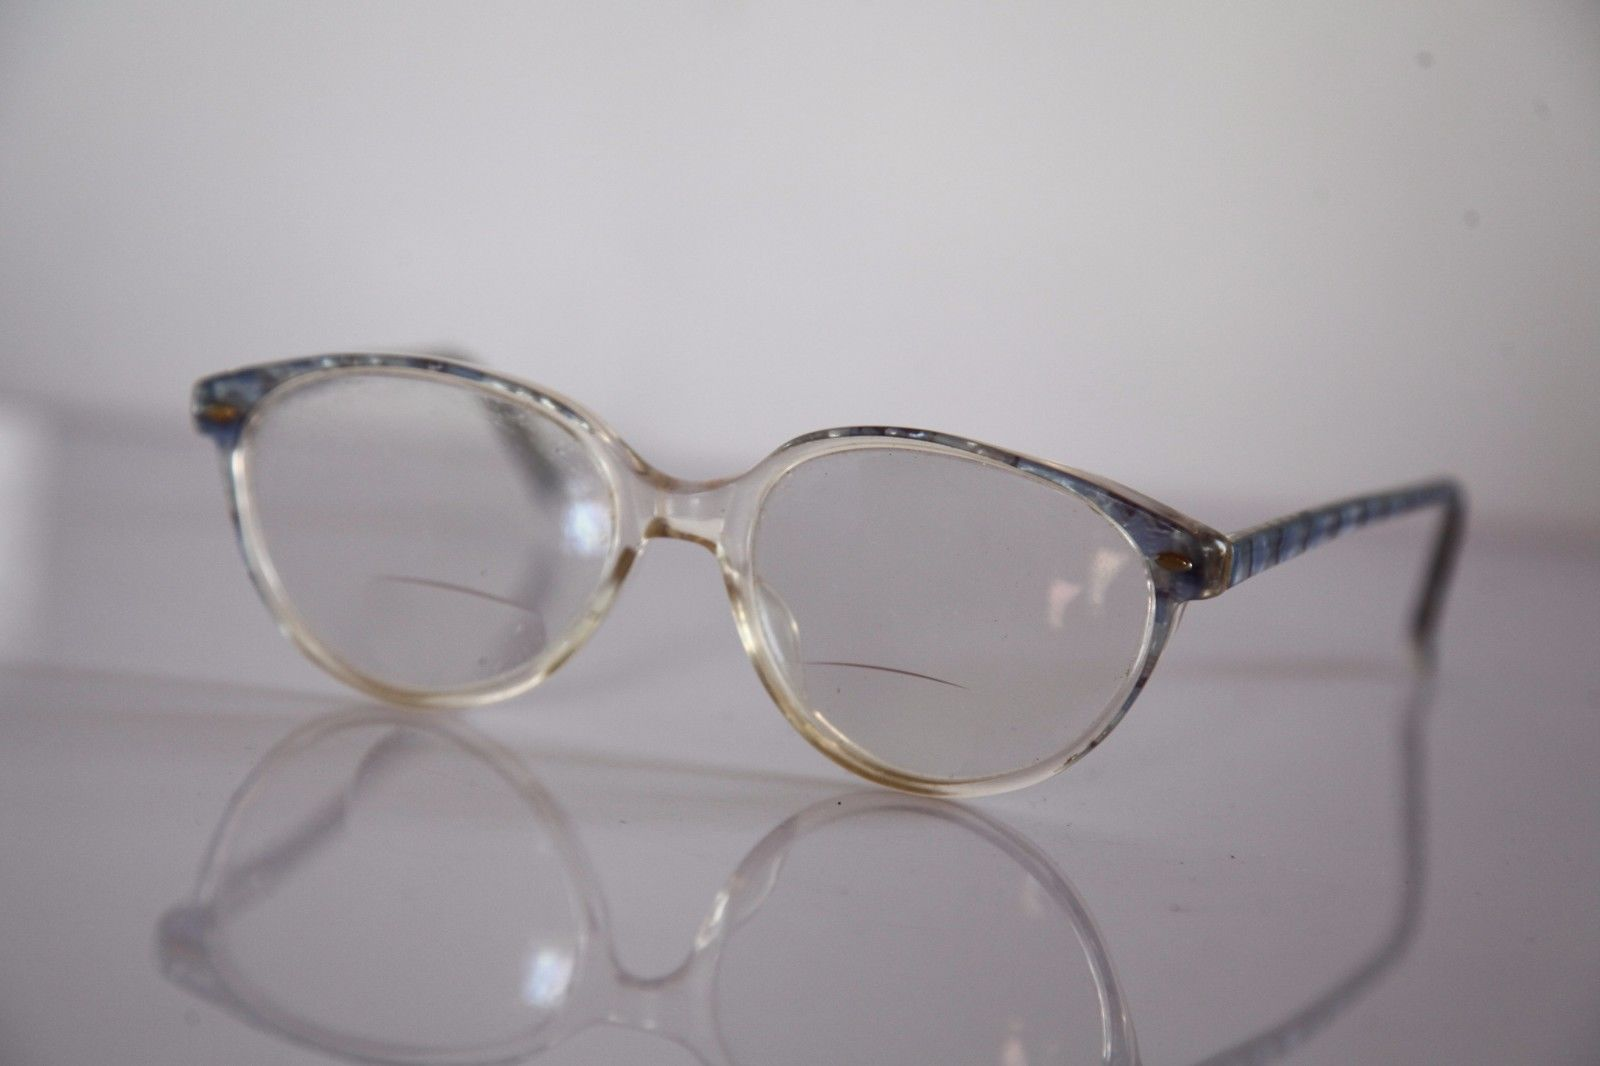 Eyewear, Crystal Multi-color  Frame, RX-Able Prescription Lenses.